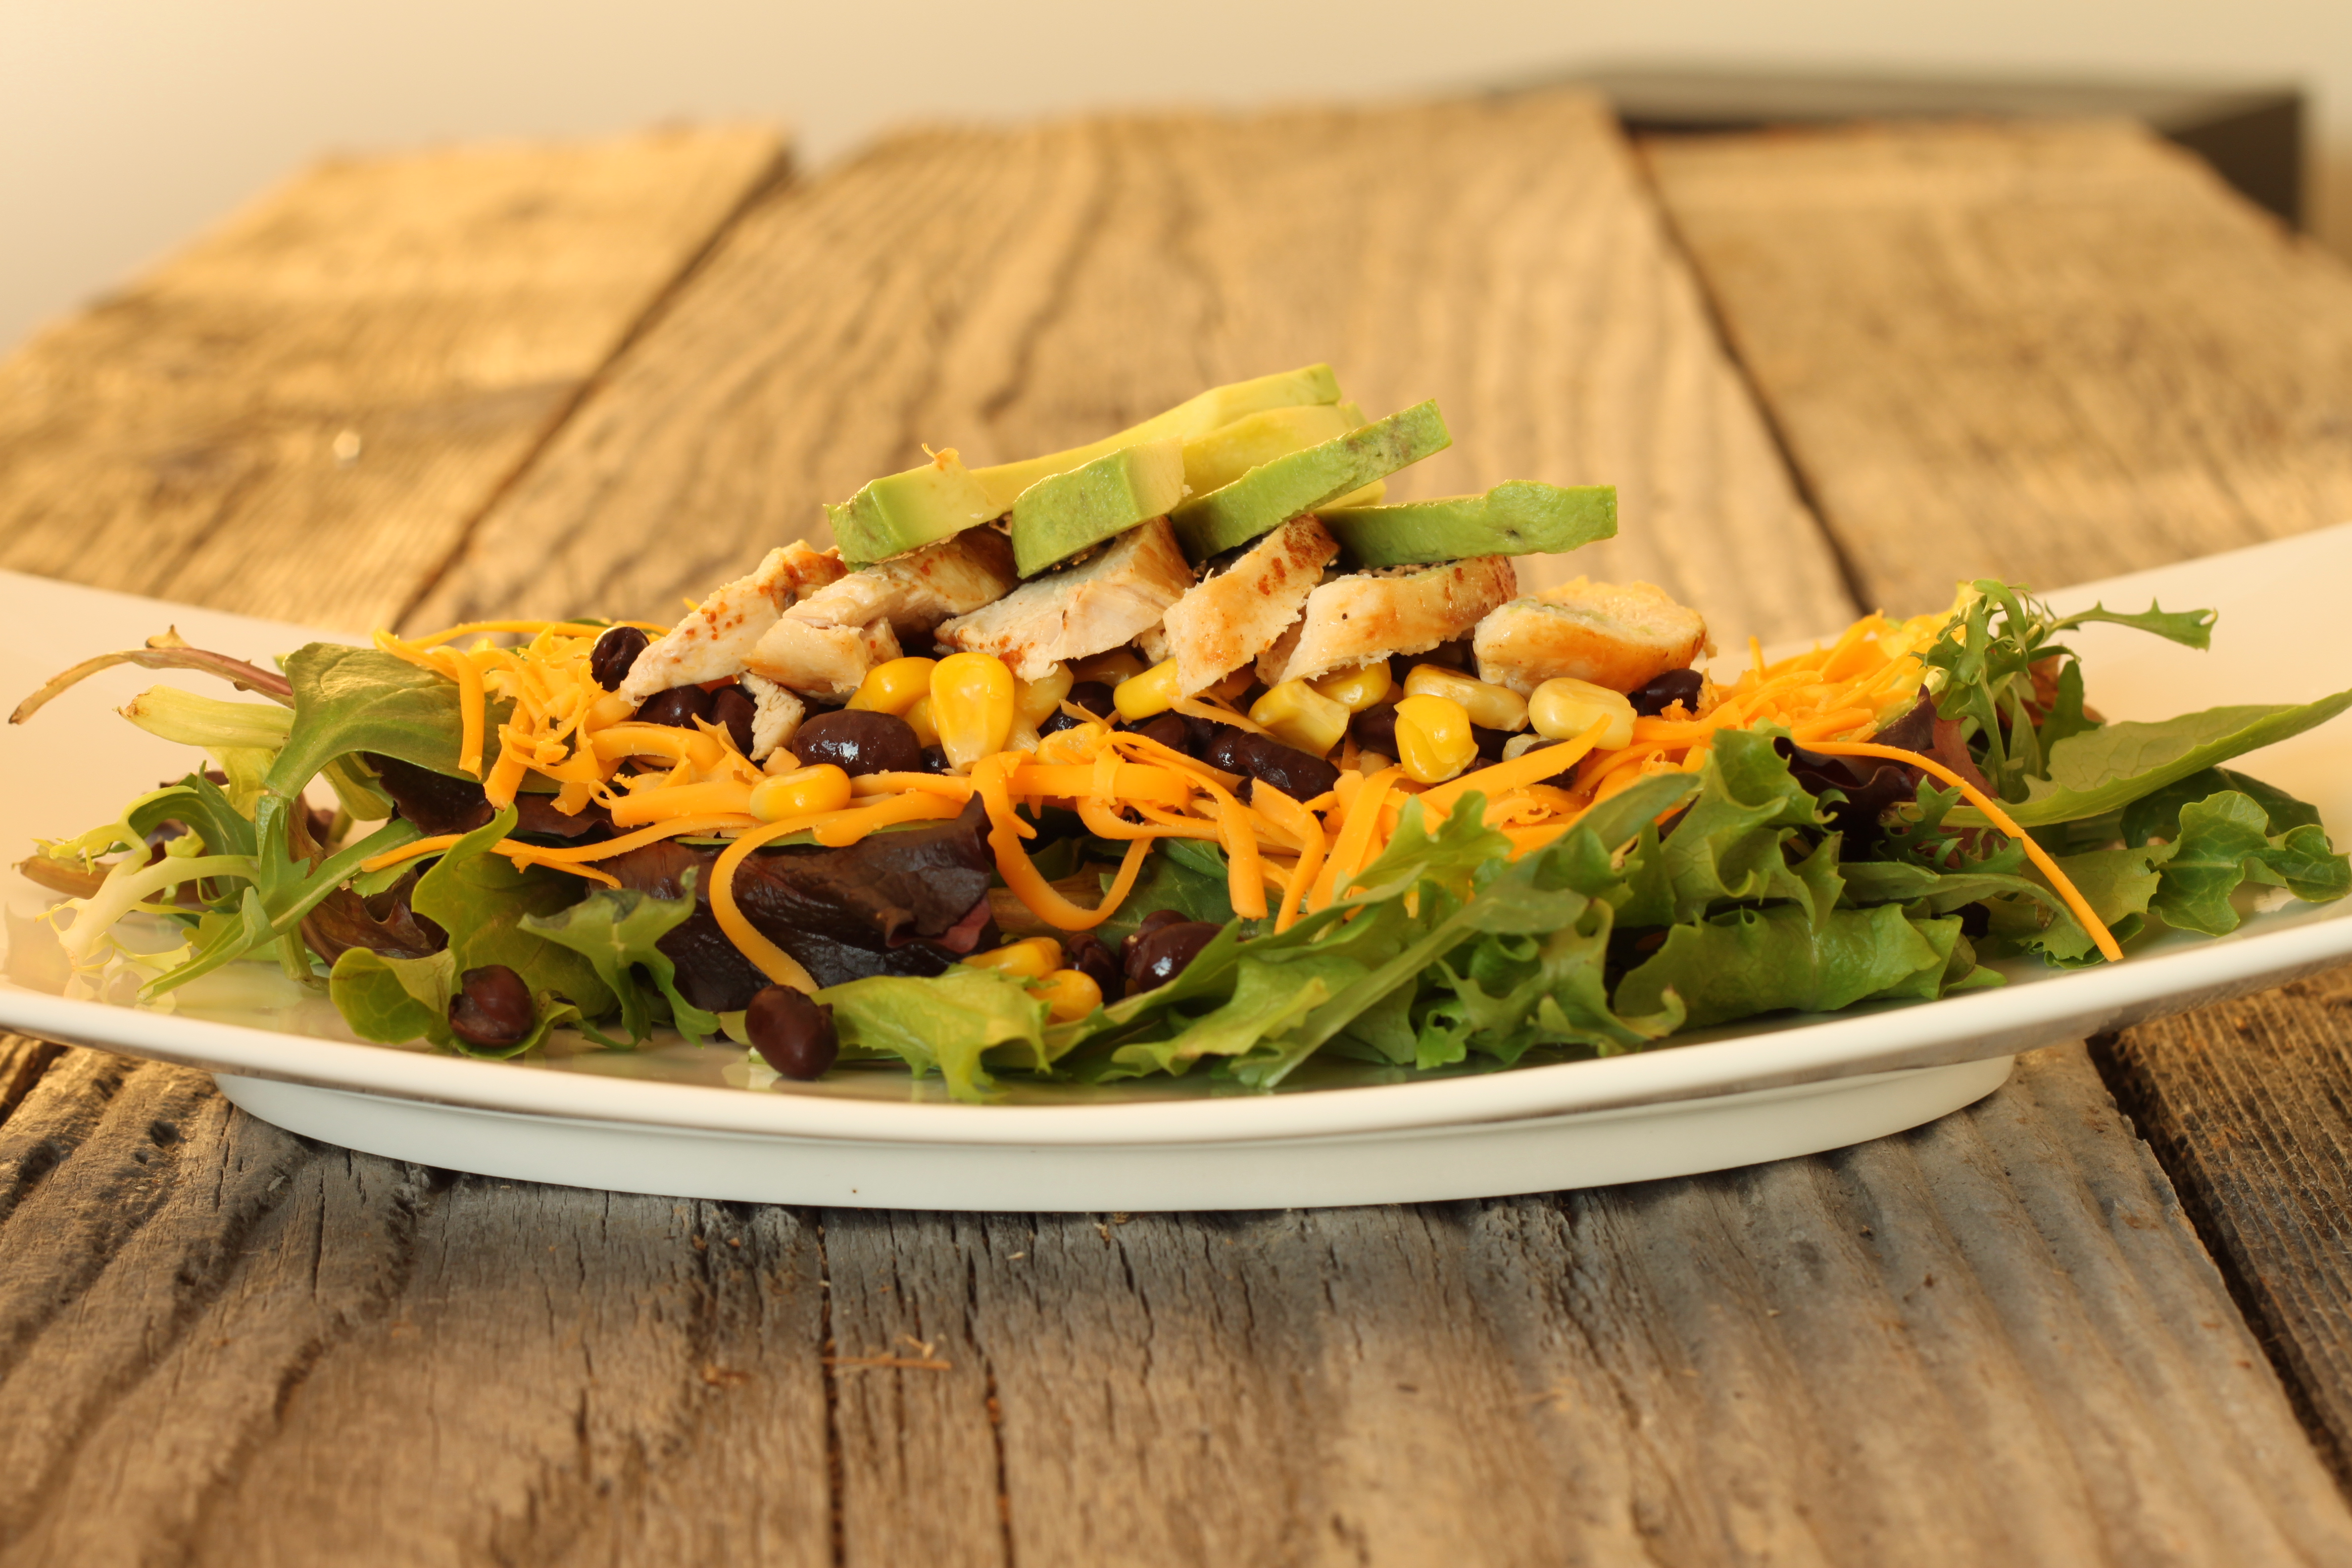 Southwestern Salad - I Adore Food!